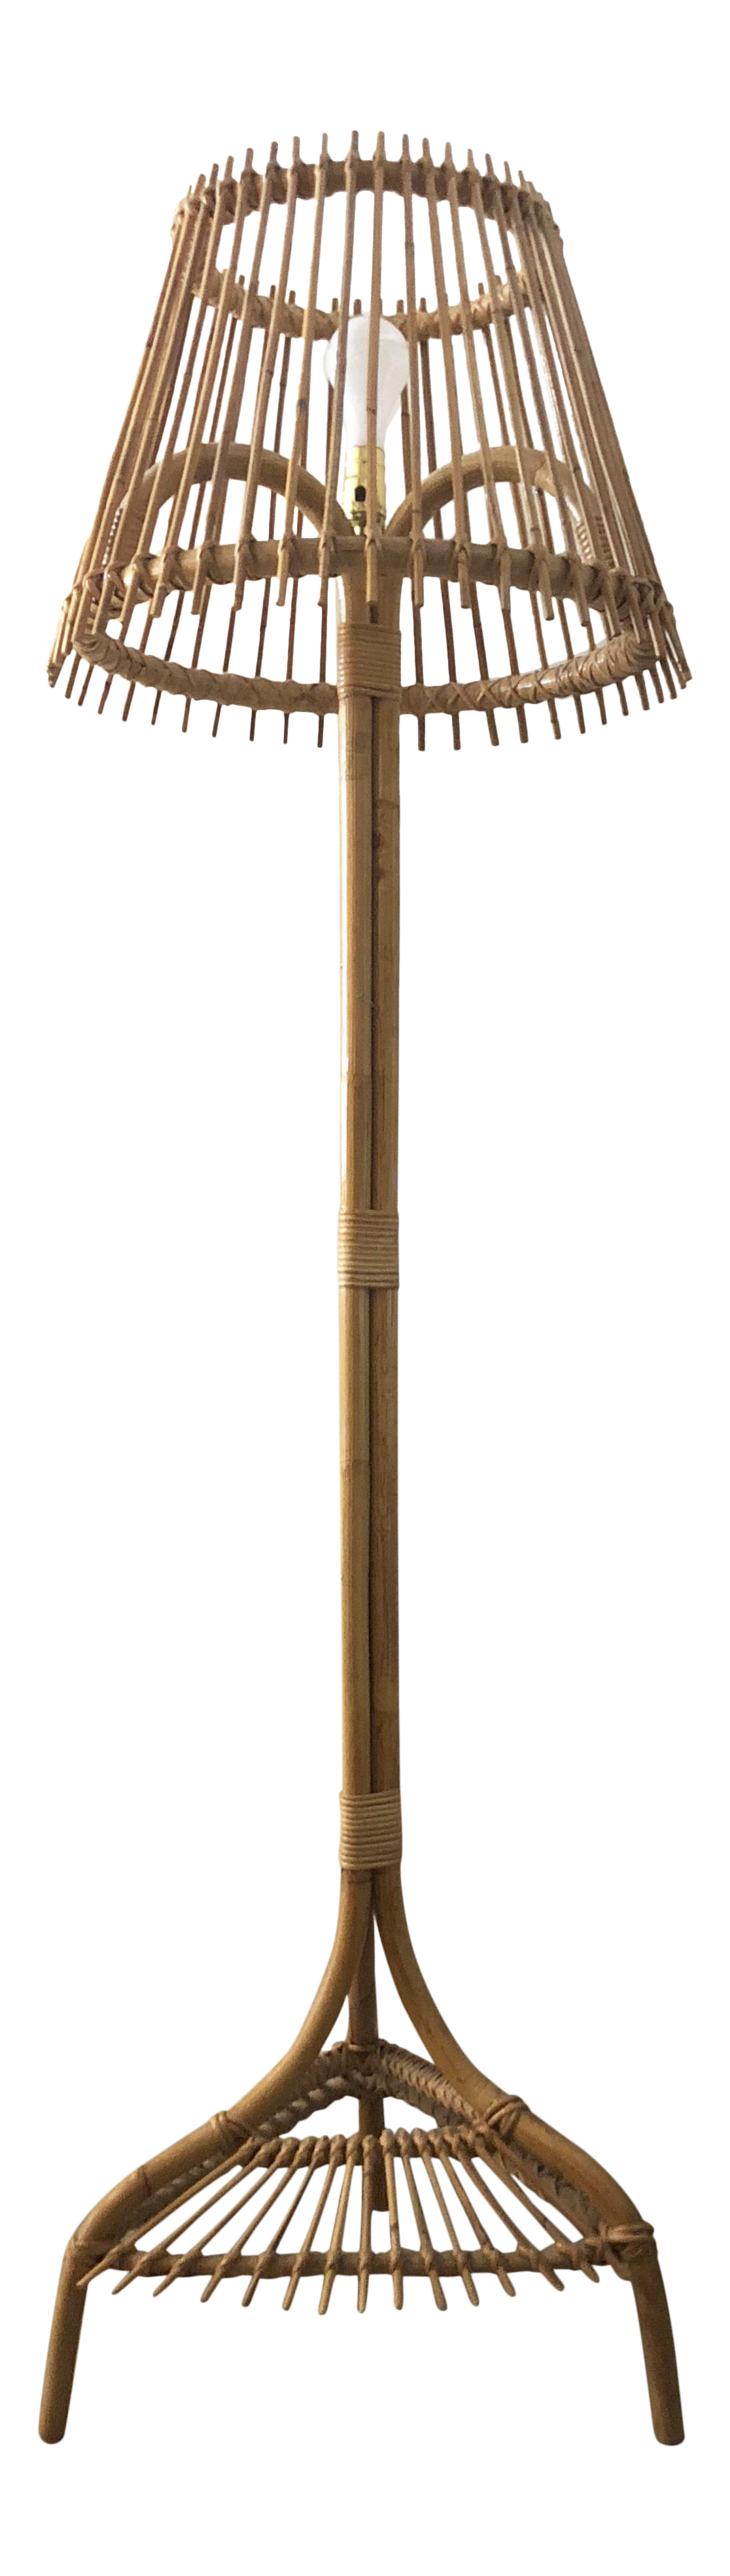 Mid Century Bamboo Floor Lamp   Image 1 Of 10